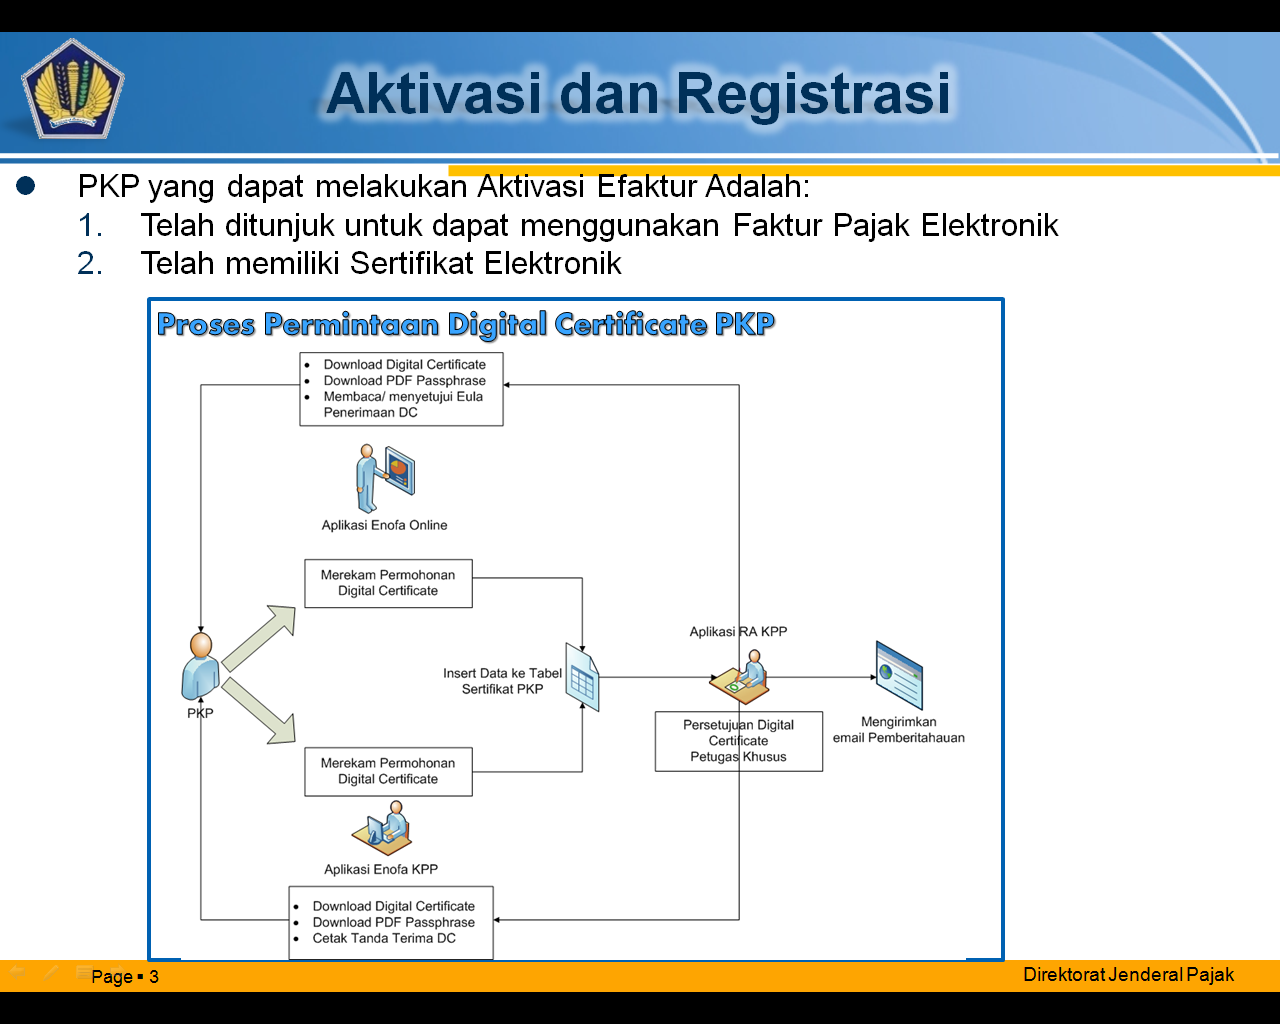 alur aktivasi dan registrasi aplikasi e-faktur pajak